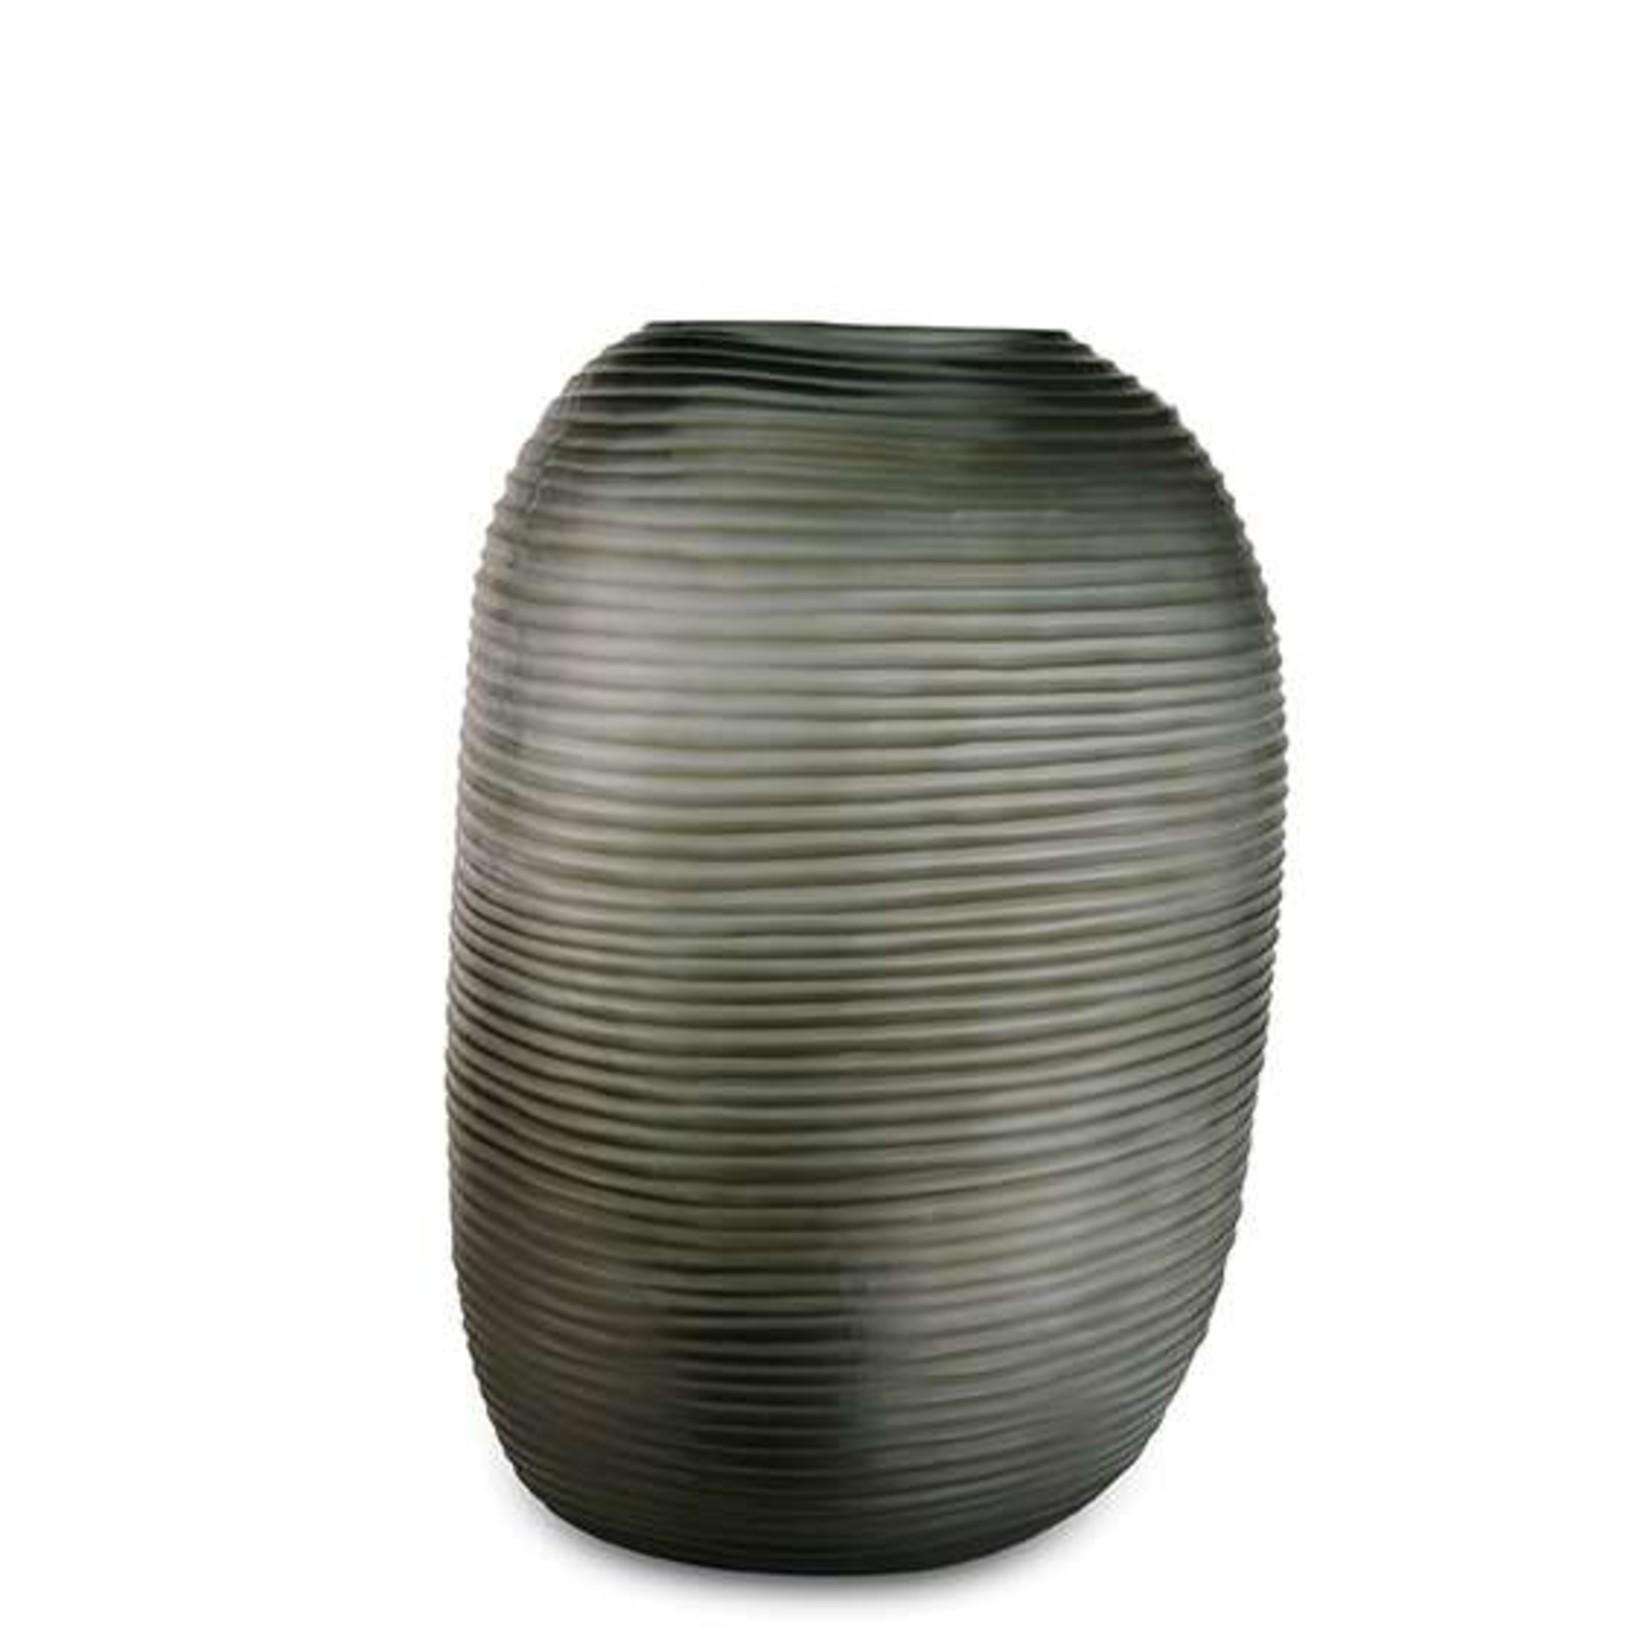 Guaxs Vase Patara Tall   Indigo / Smoke Gray